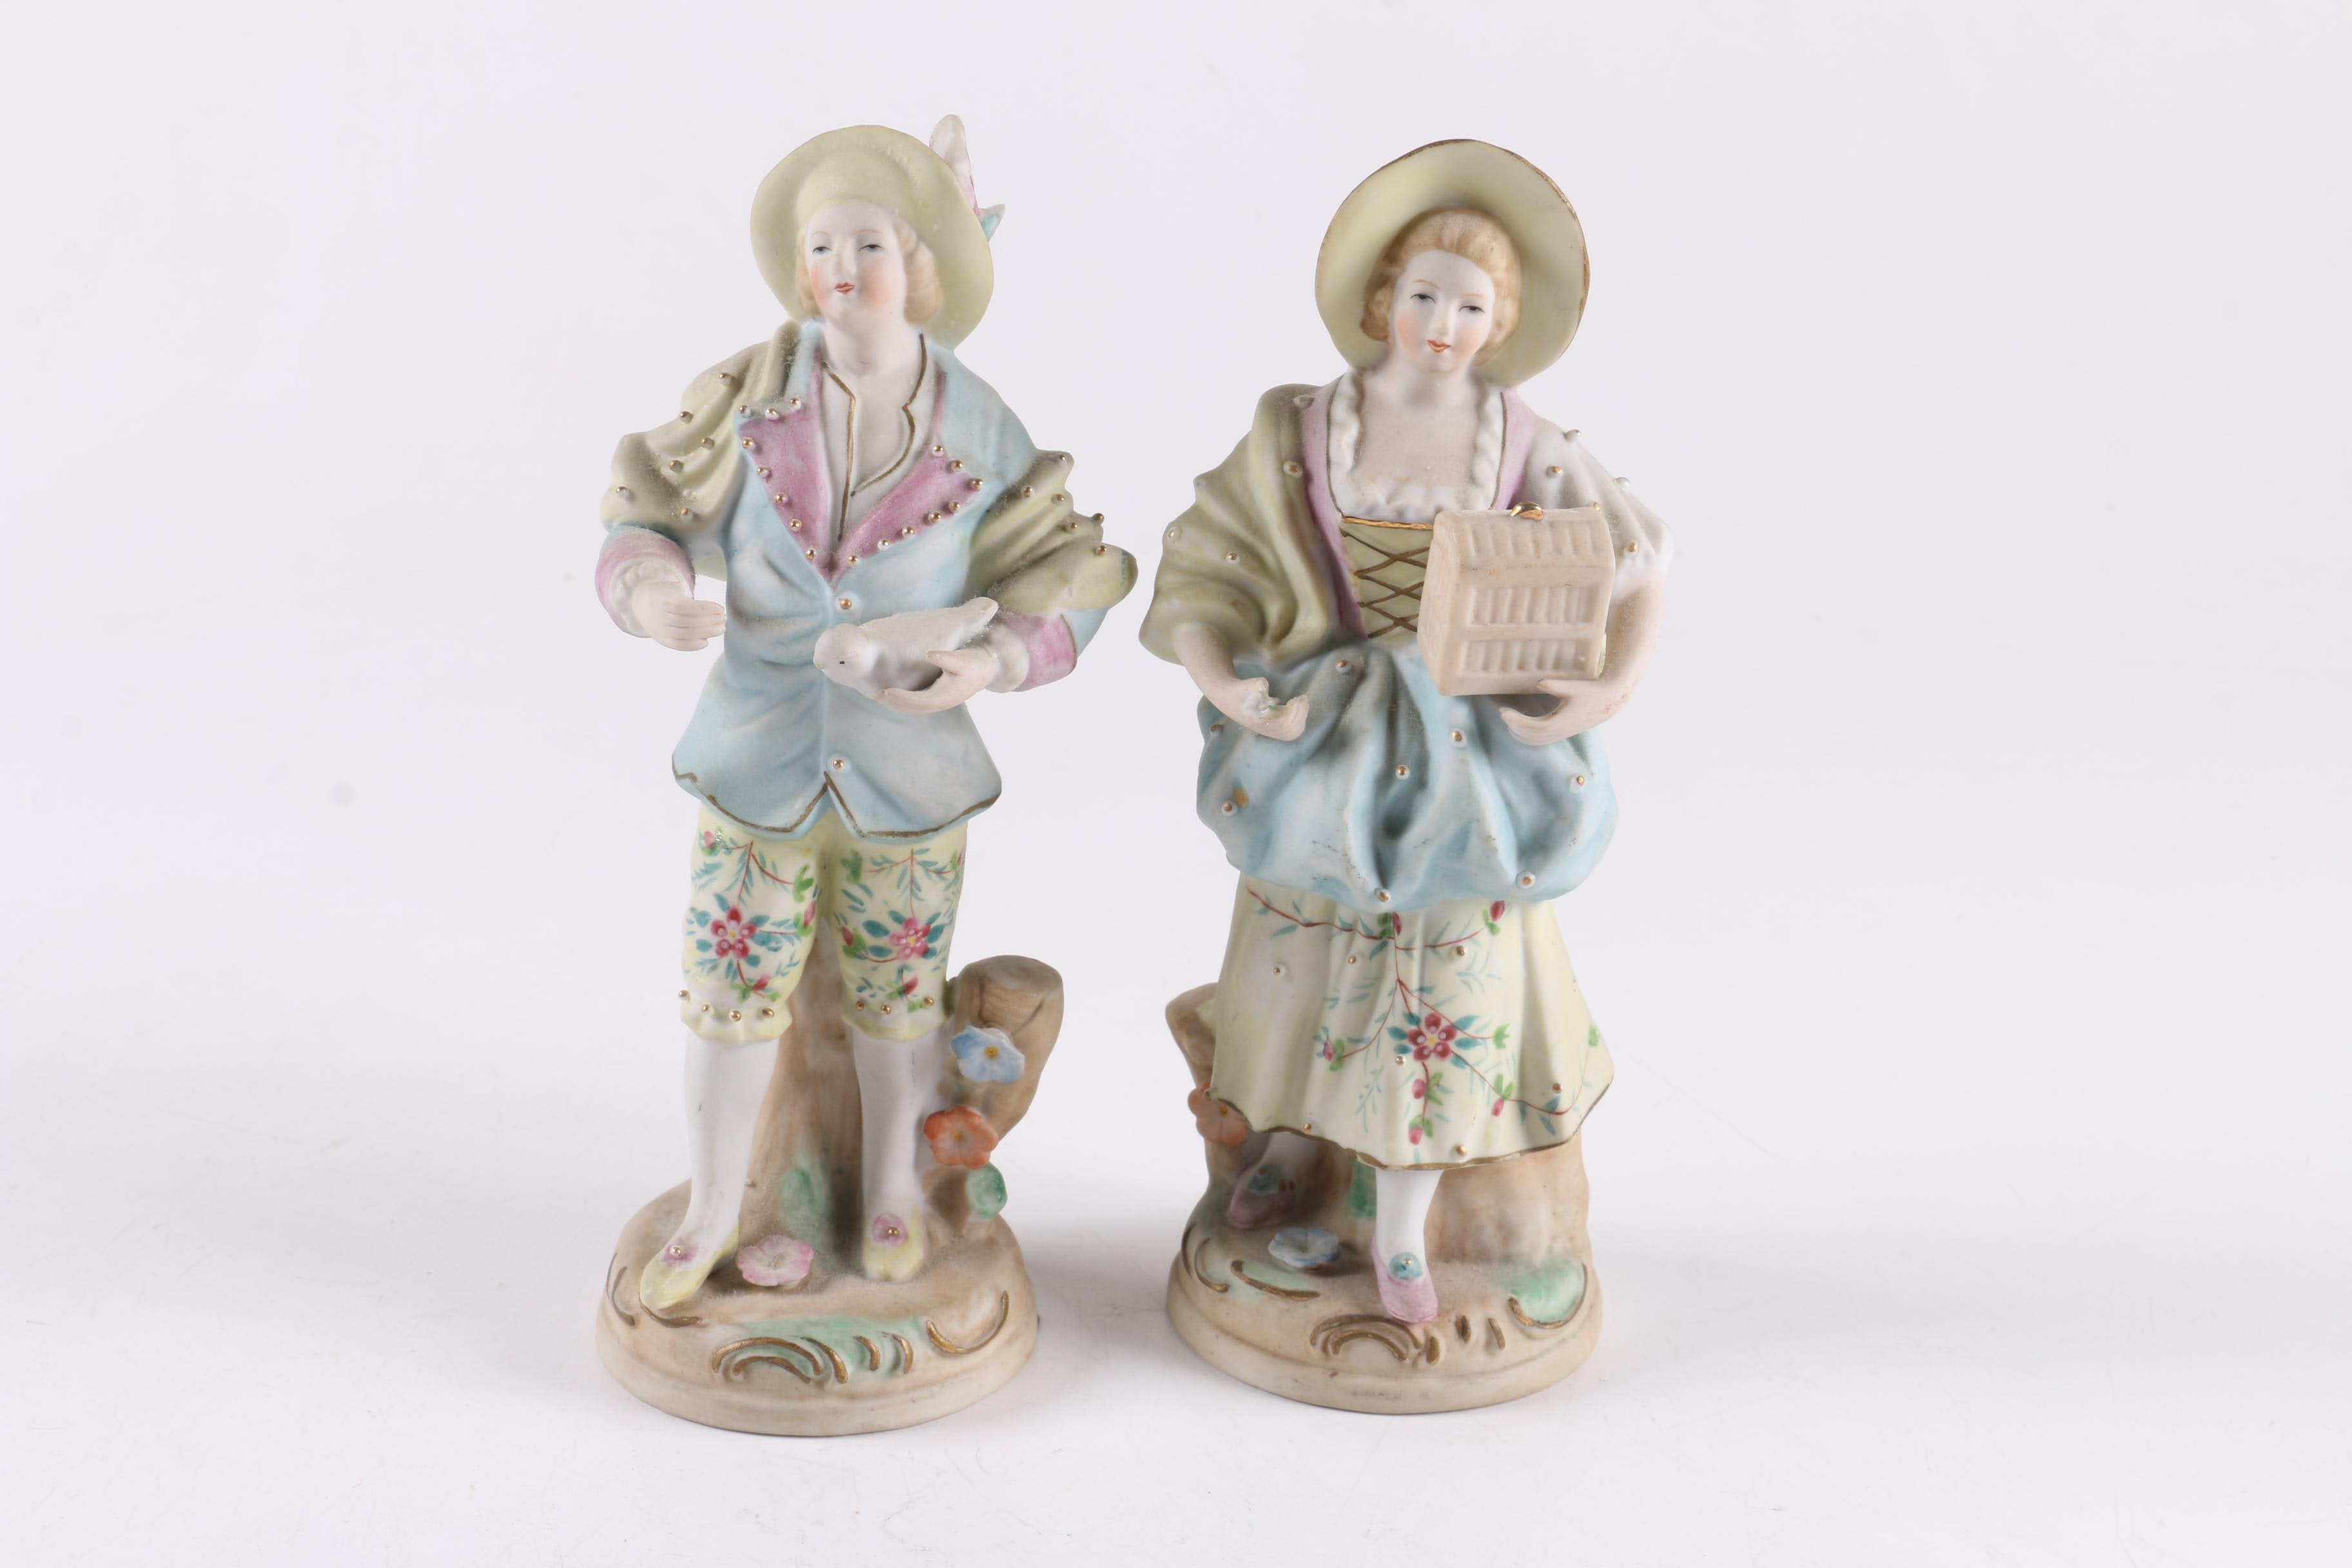 Pair of Vintage Bisque Porcelain Figurines